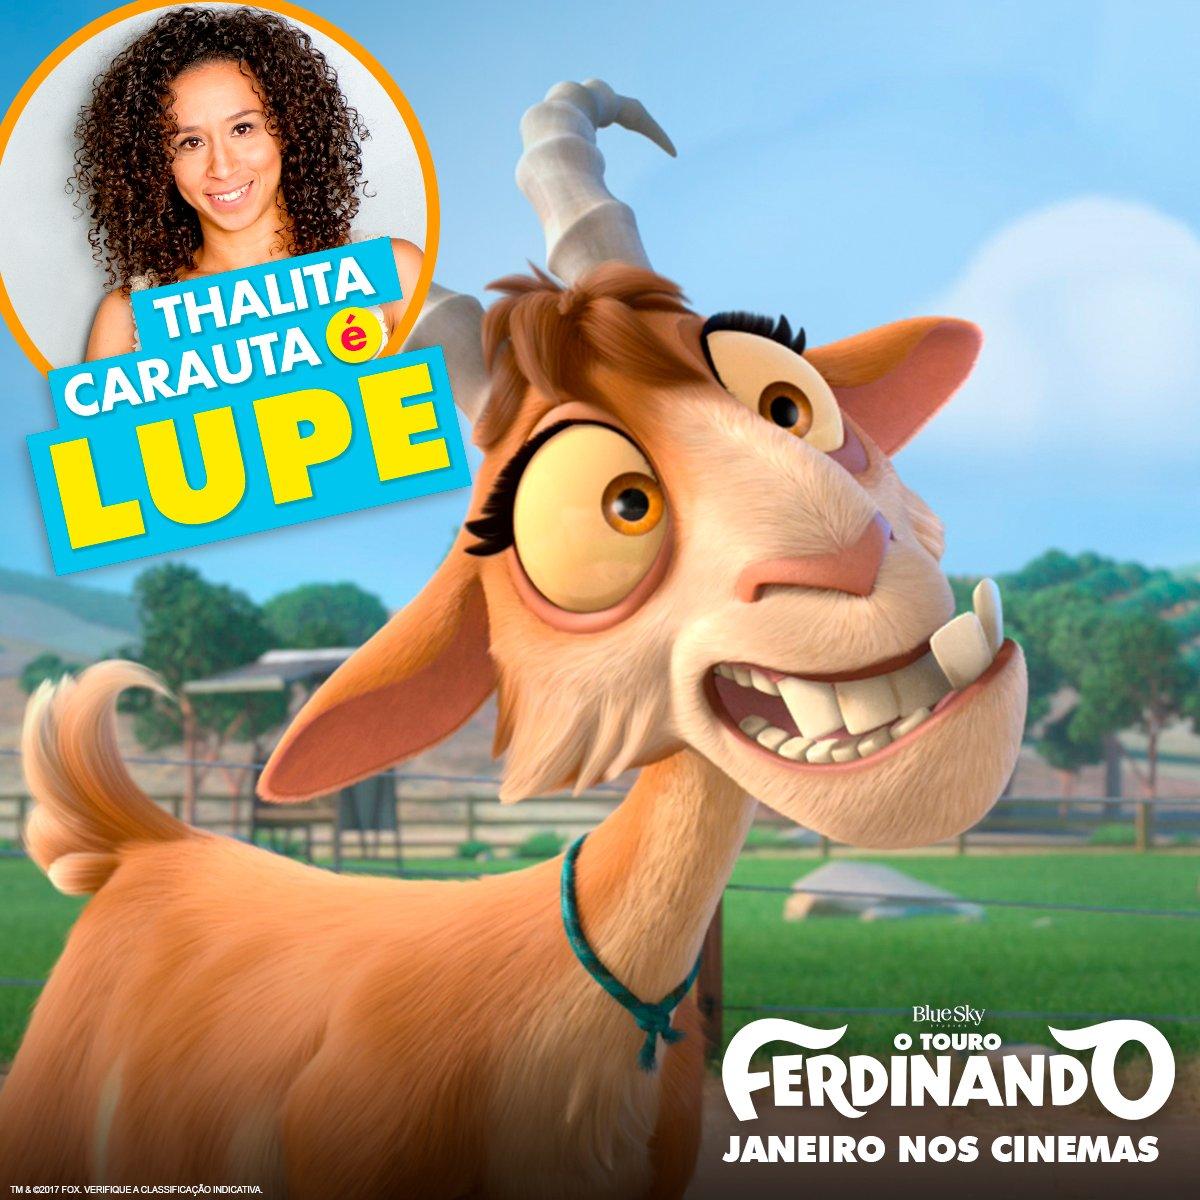 Thalita Carauta voz da Lupe versao brasileira